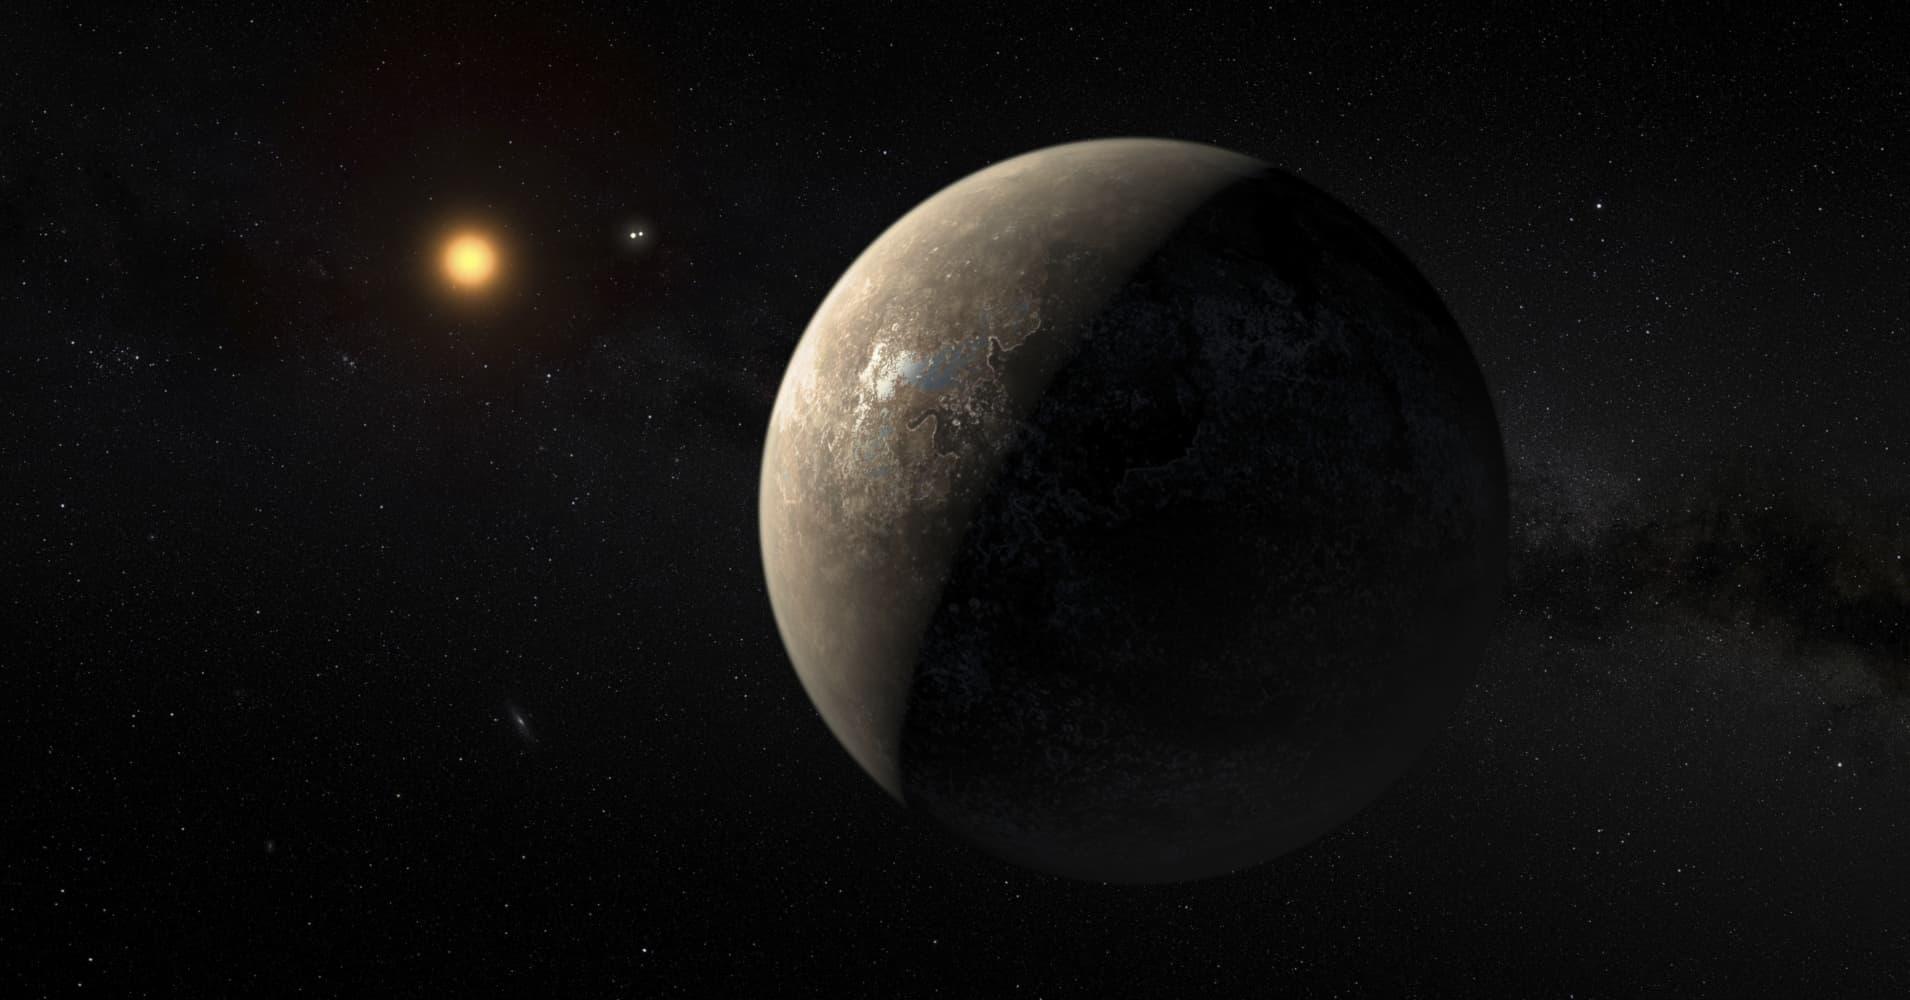 7 earthsized planets found orbiting star 39 lightyears - HD1910×999